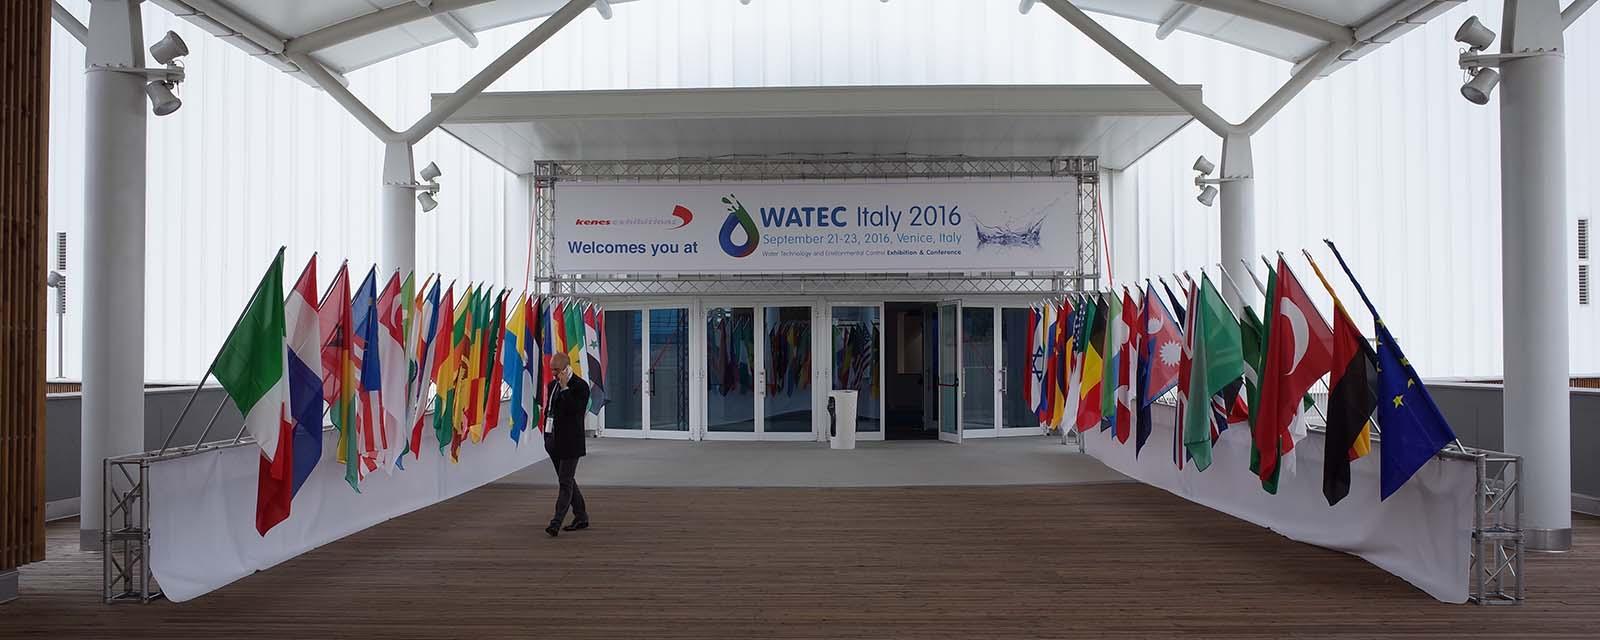 congresso_watec